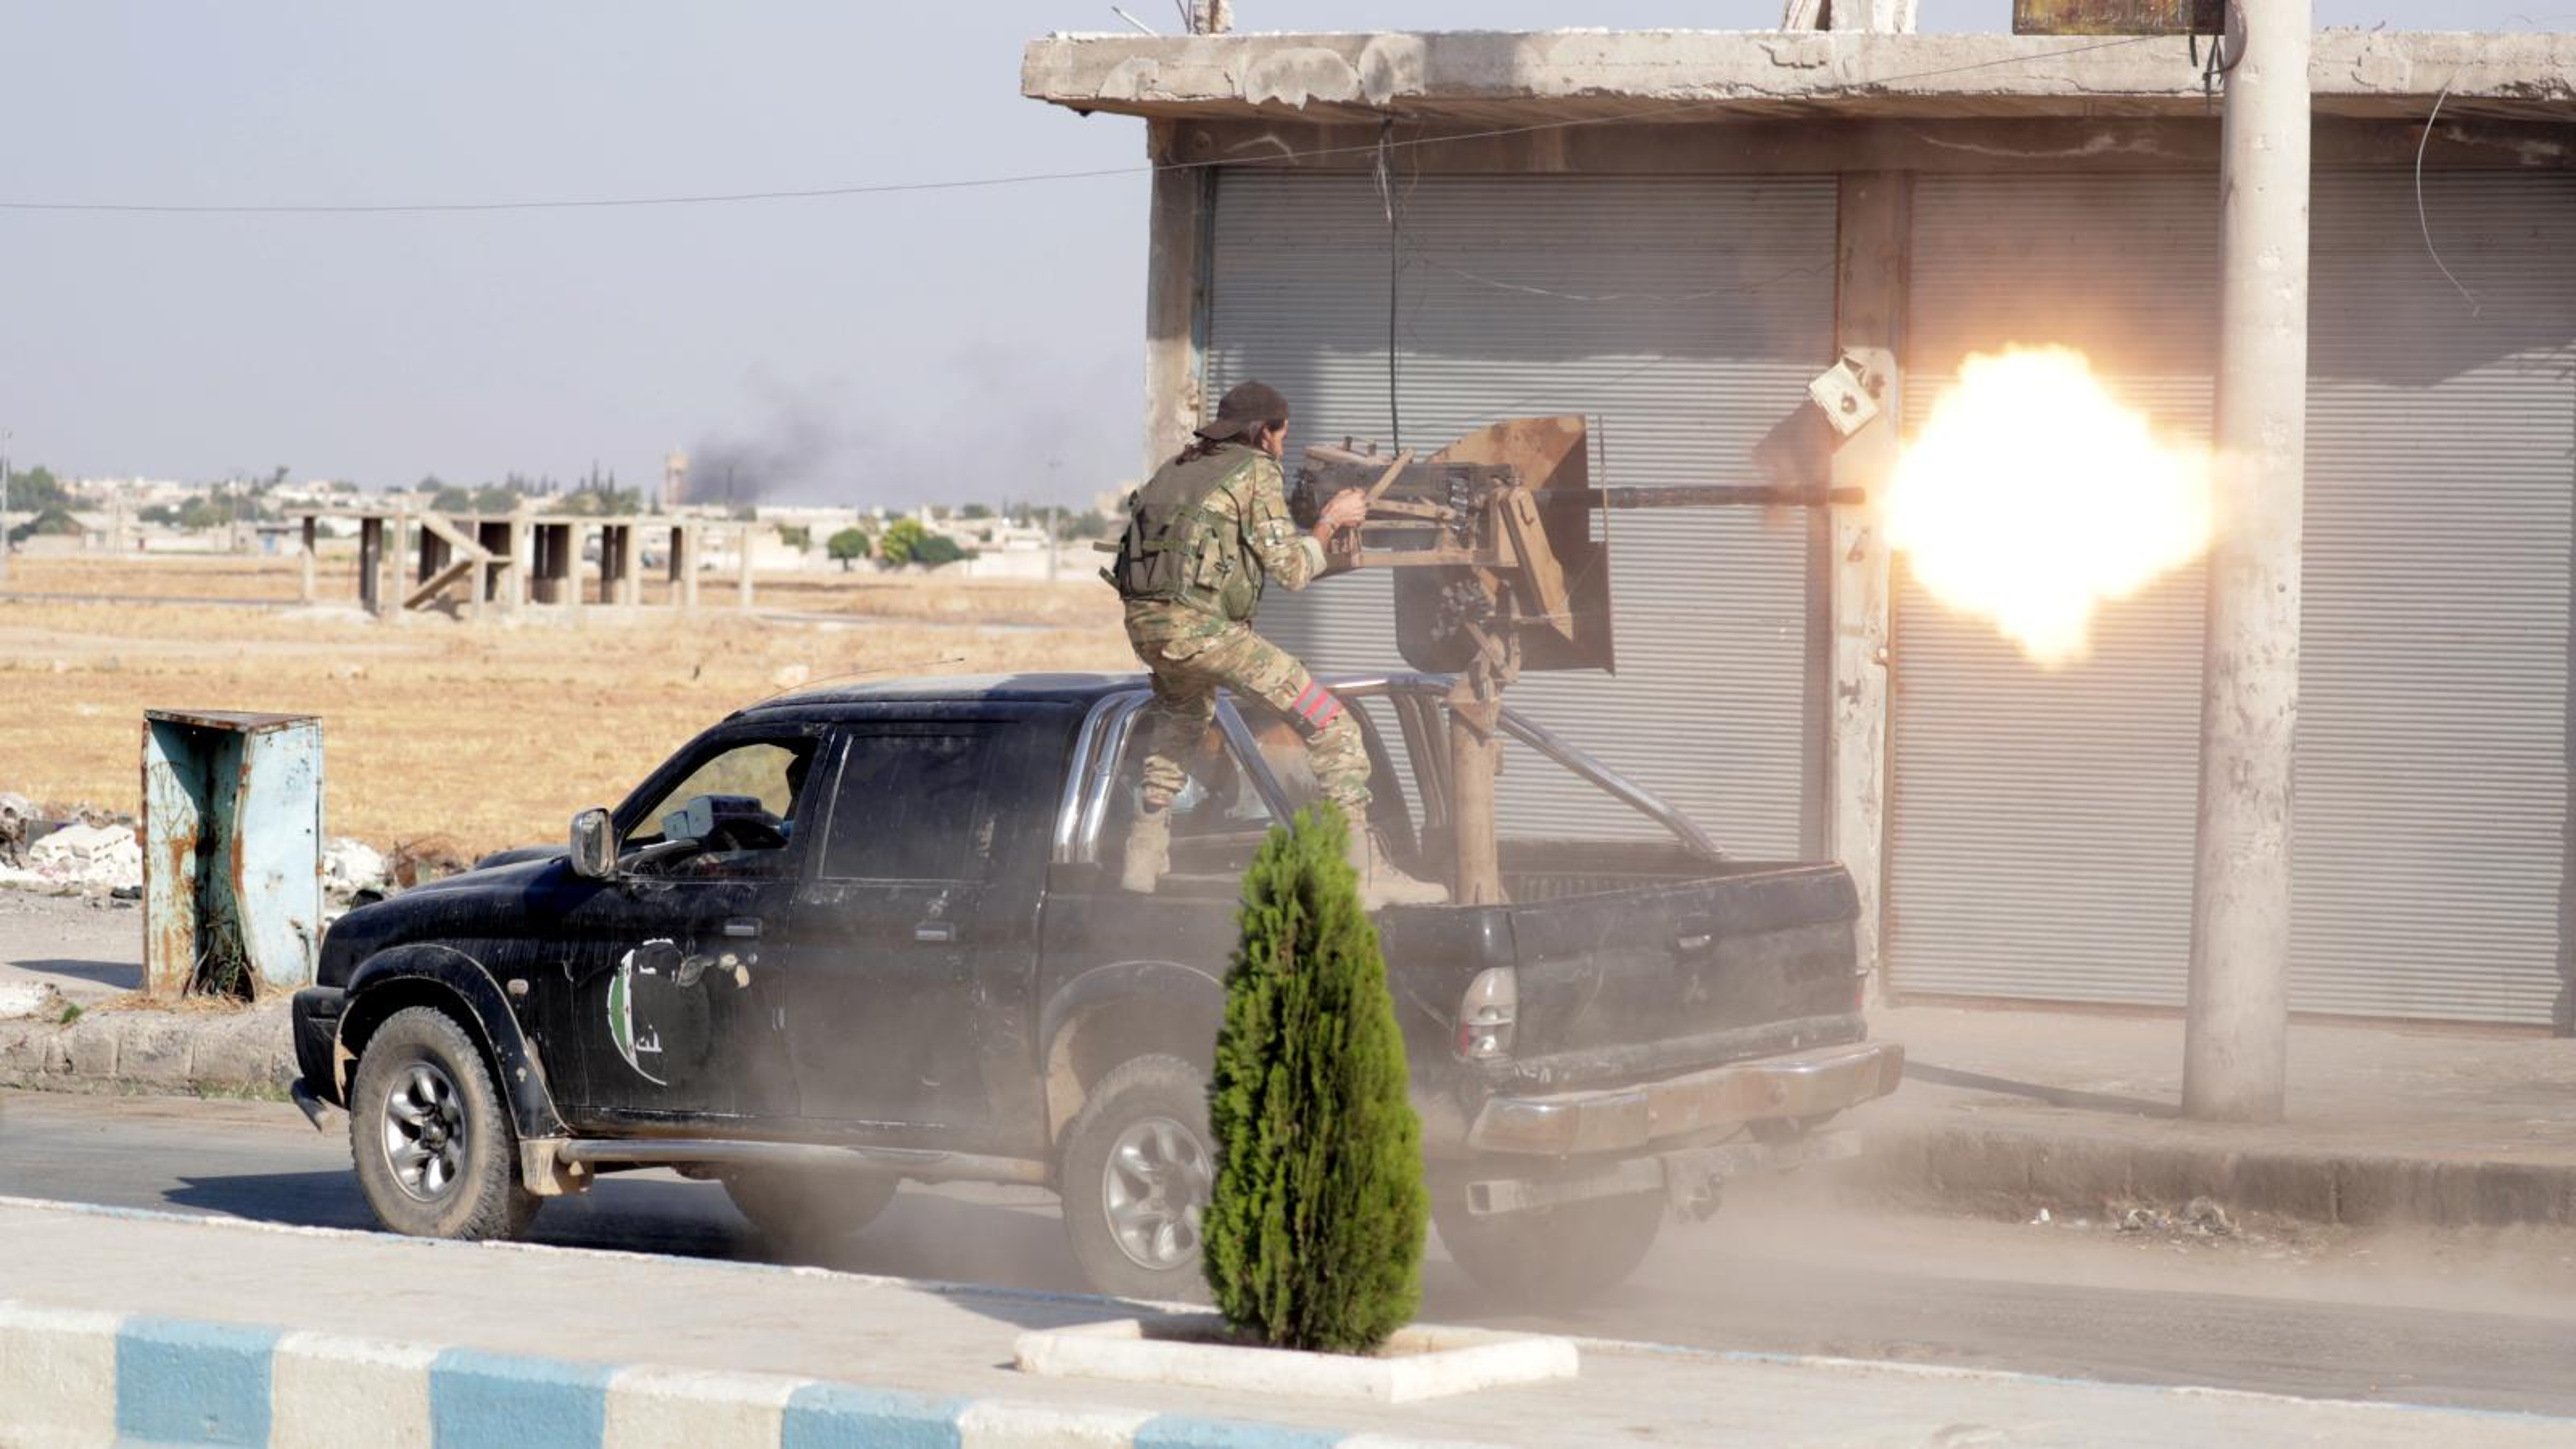 Trump S Syria Retreat Blamed For Murder Of Hervin Khalaf Quartz